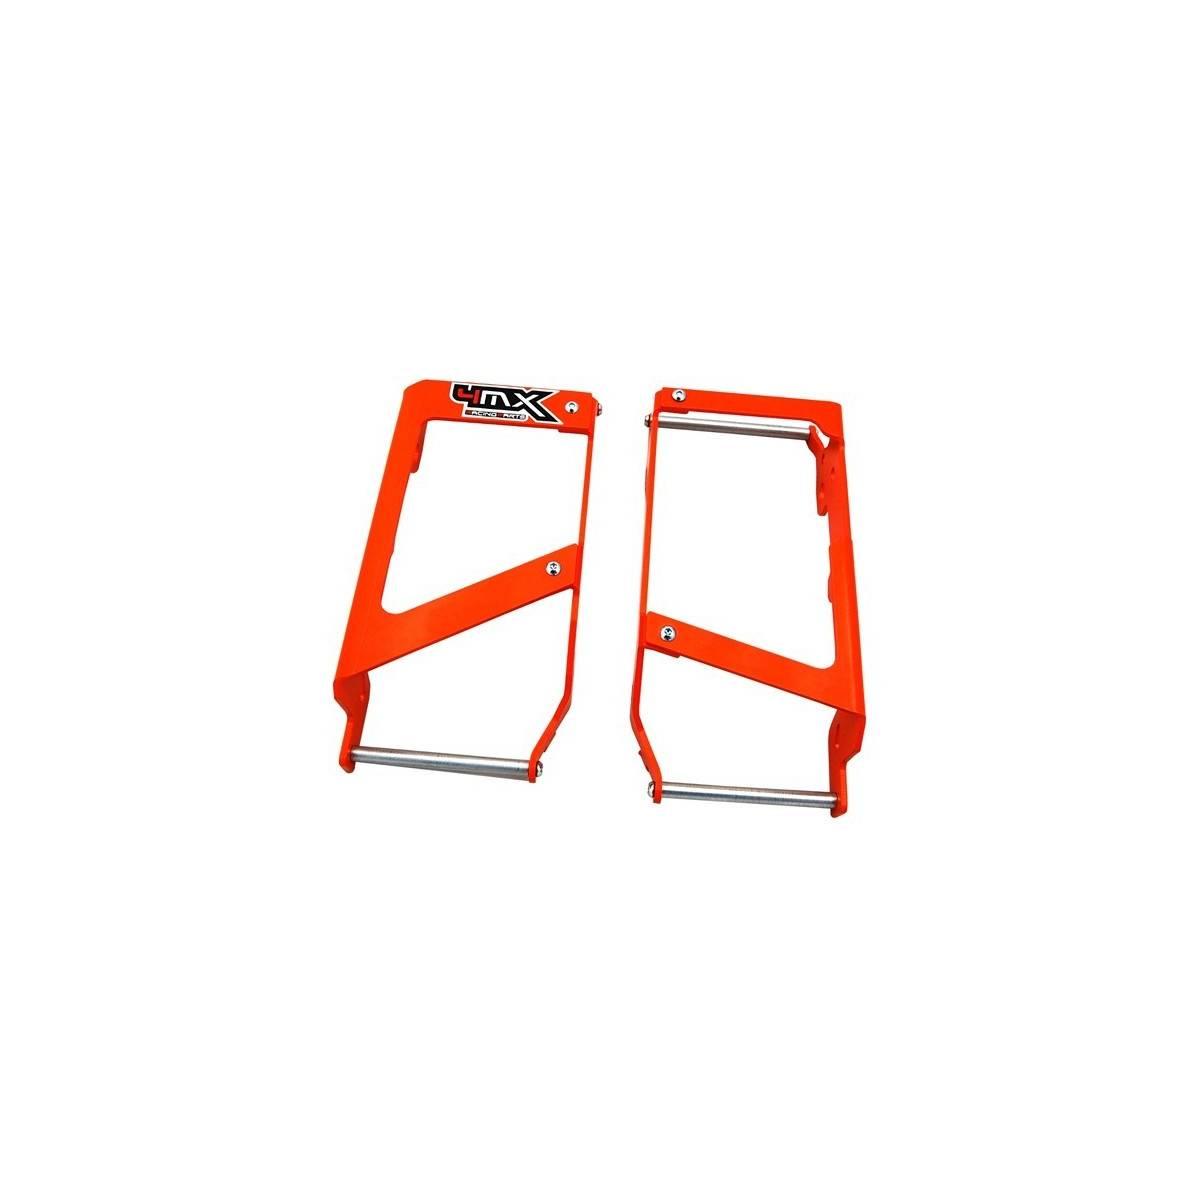 4MX.RGOR - Protector Radiador 4Mx Ktm 07 15 Naranja